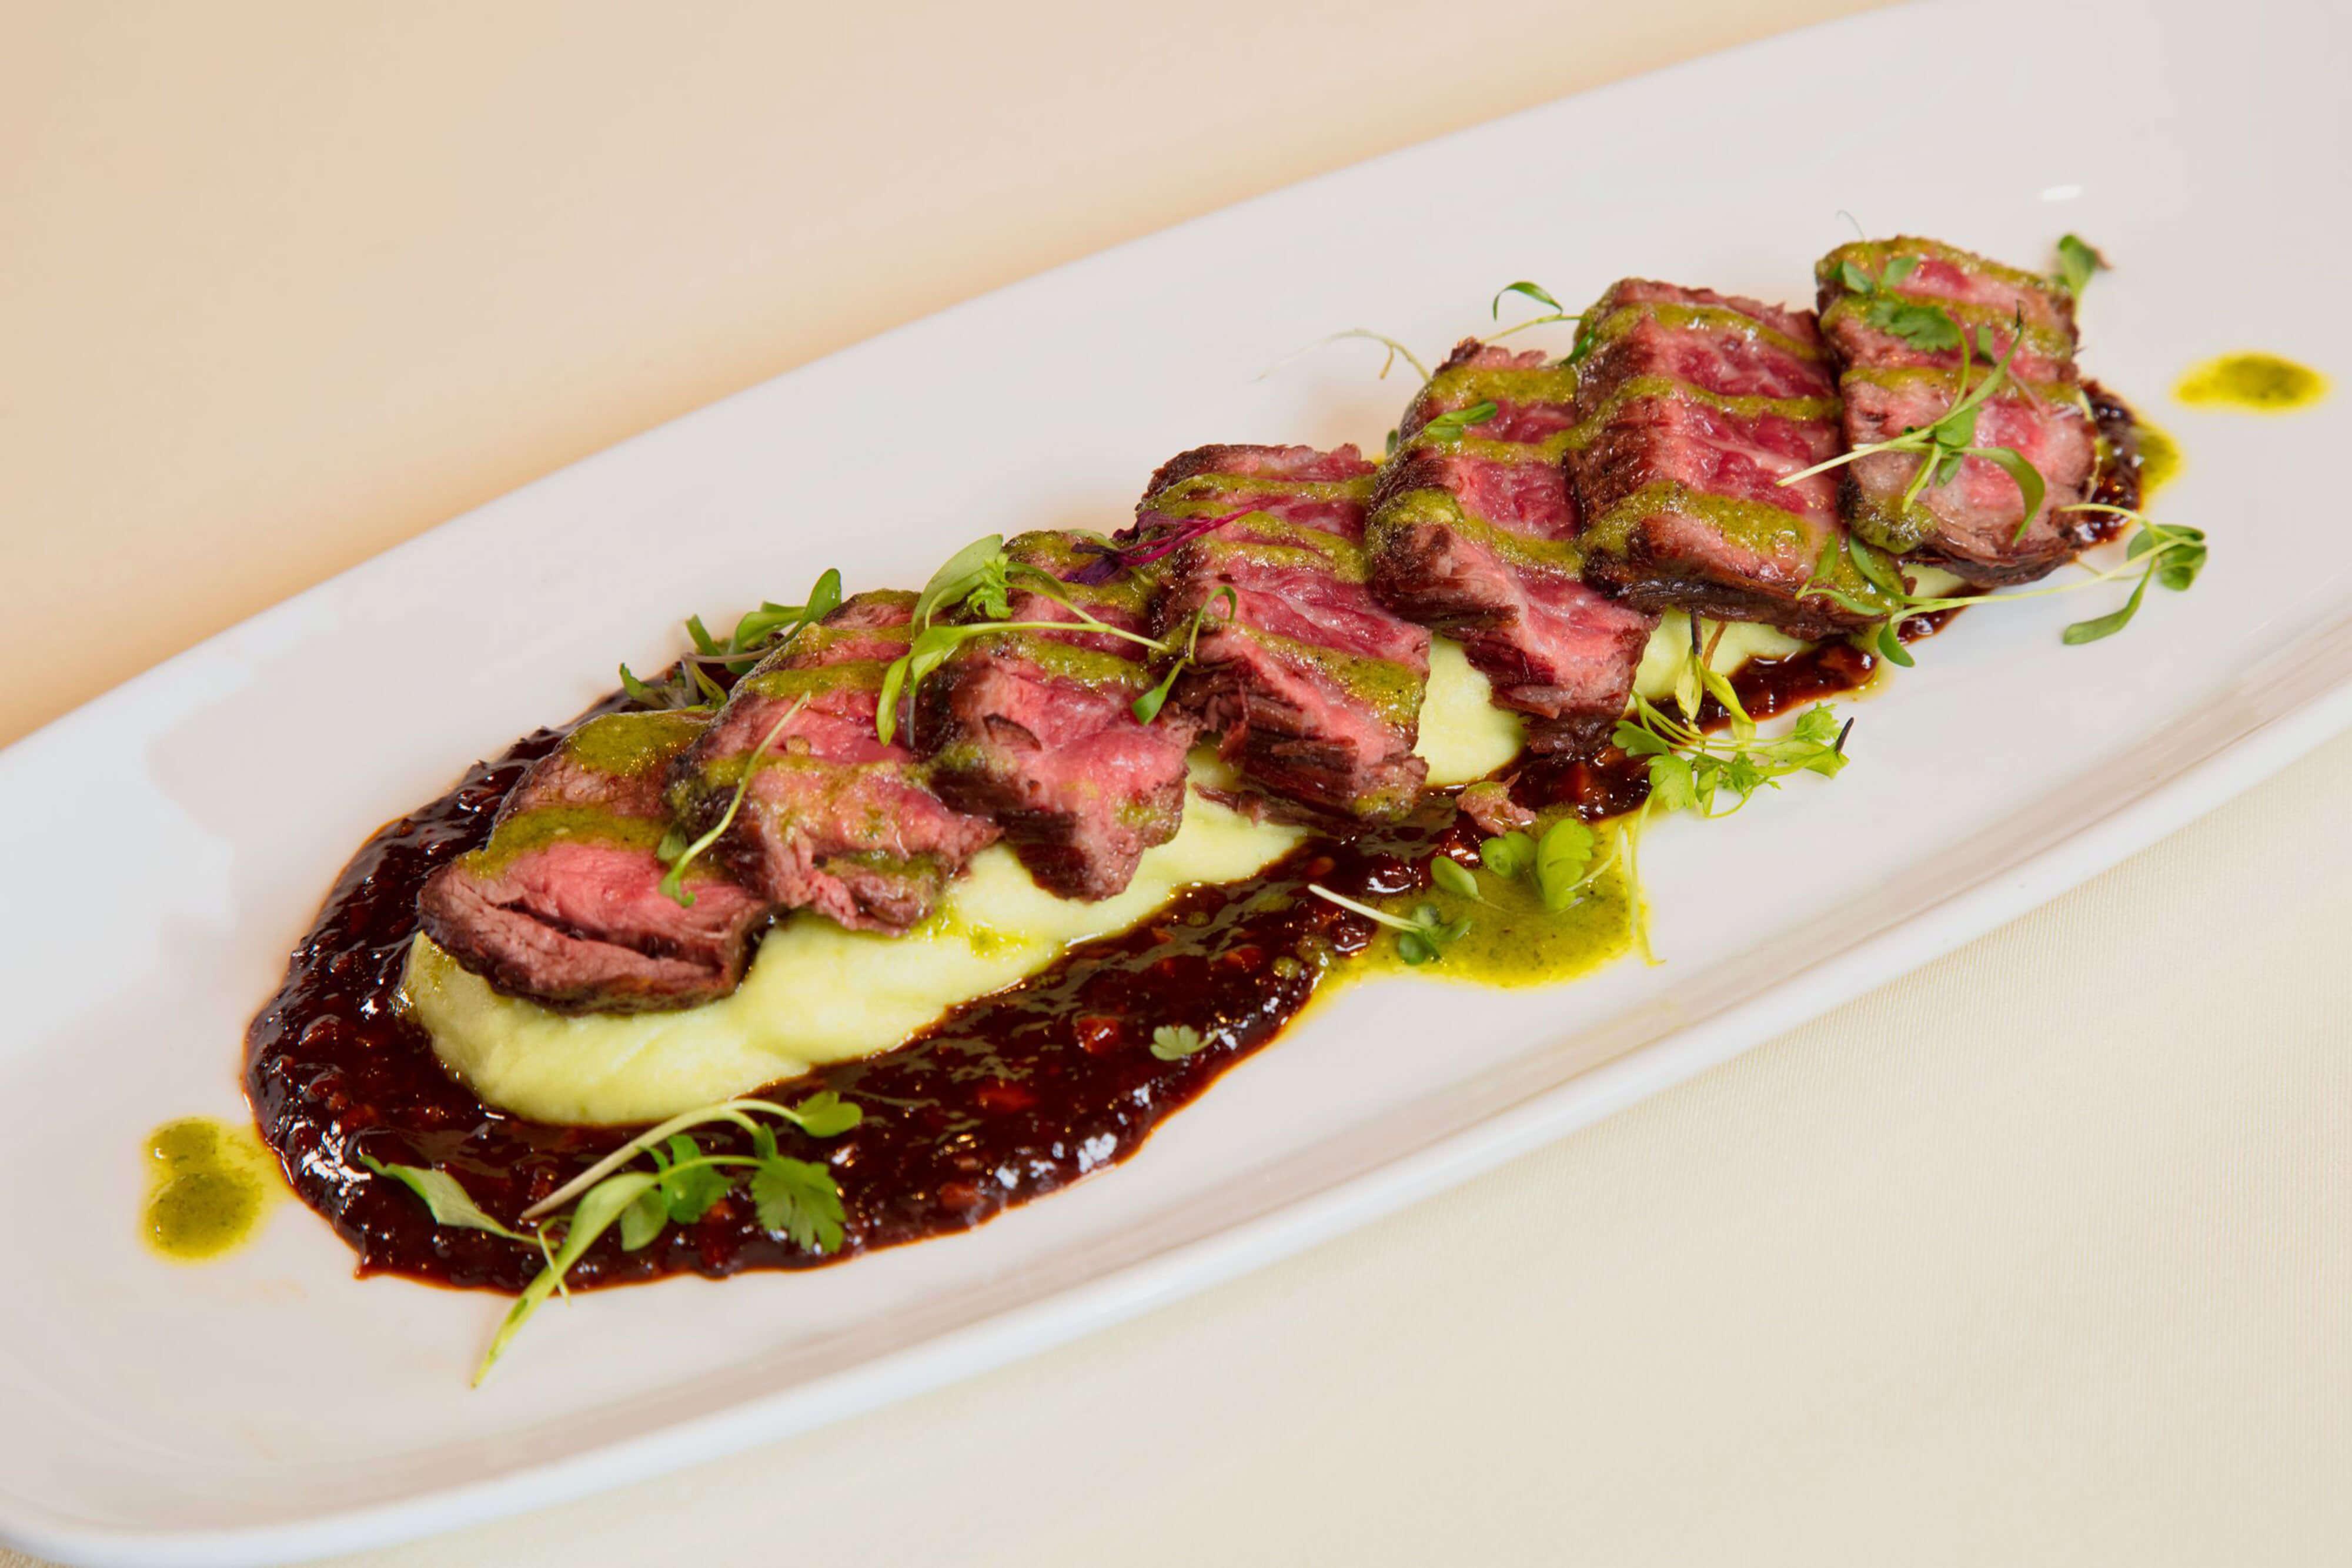 Dinner at our Park City Resort in Utah | Westgate Park City Resort & Spa | Westgate Resorts Restaurants in Park City